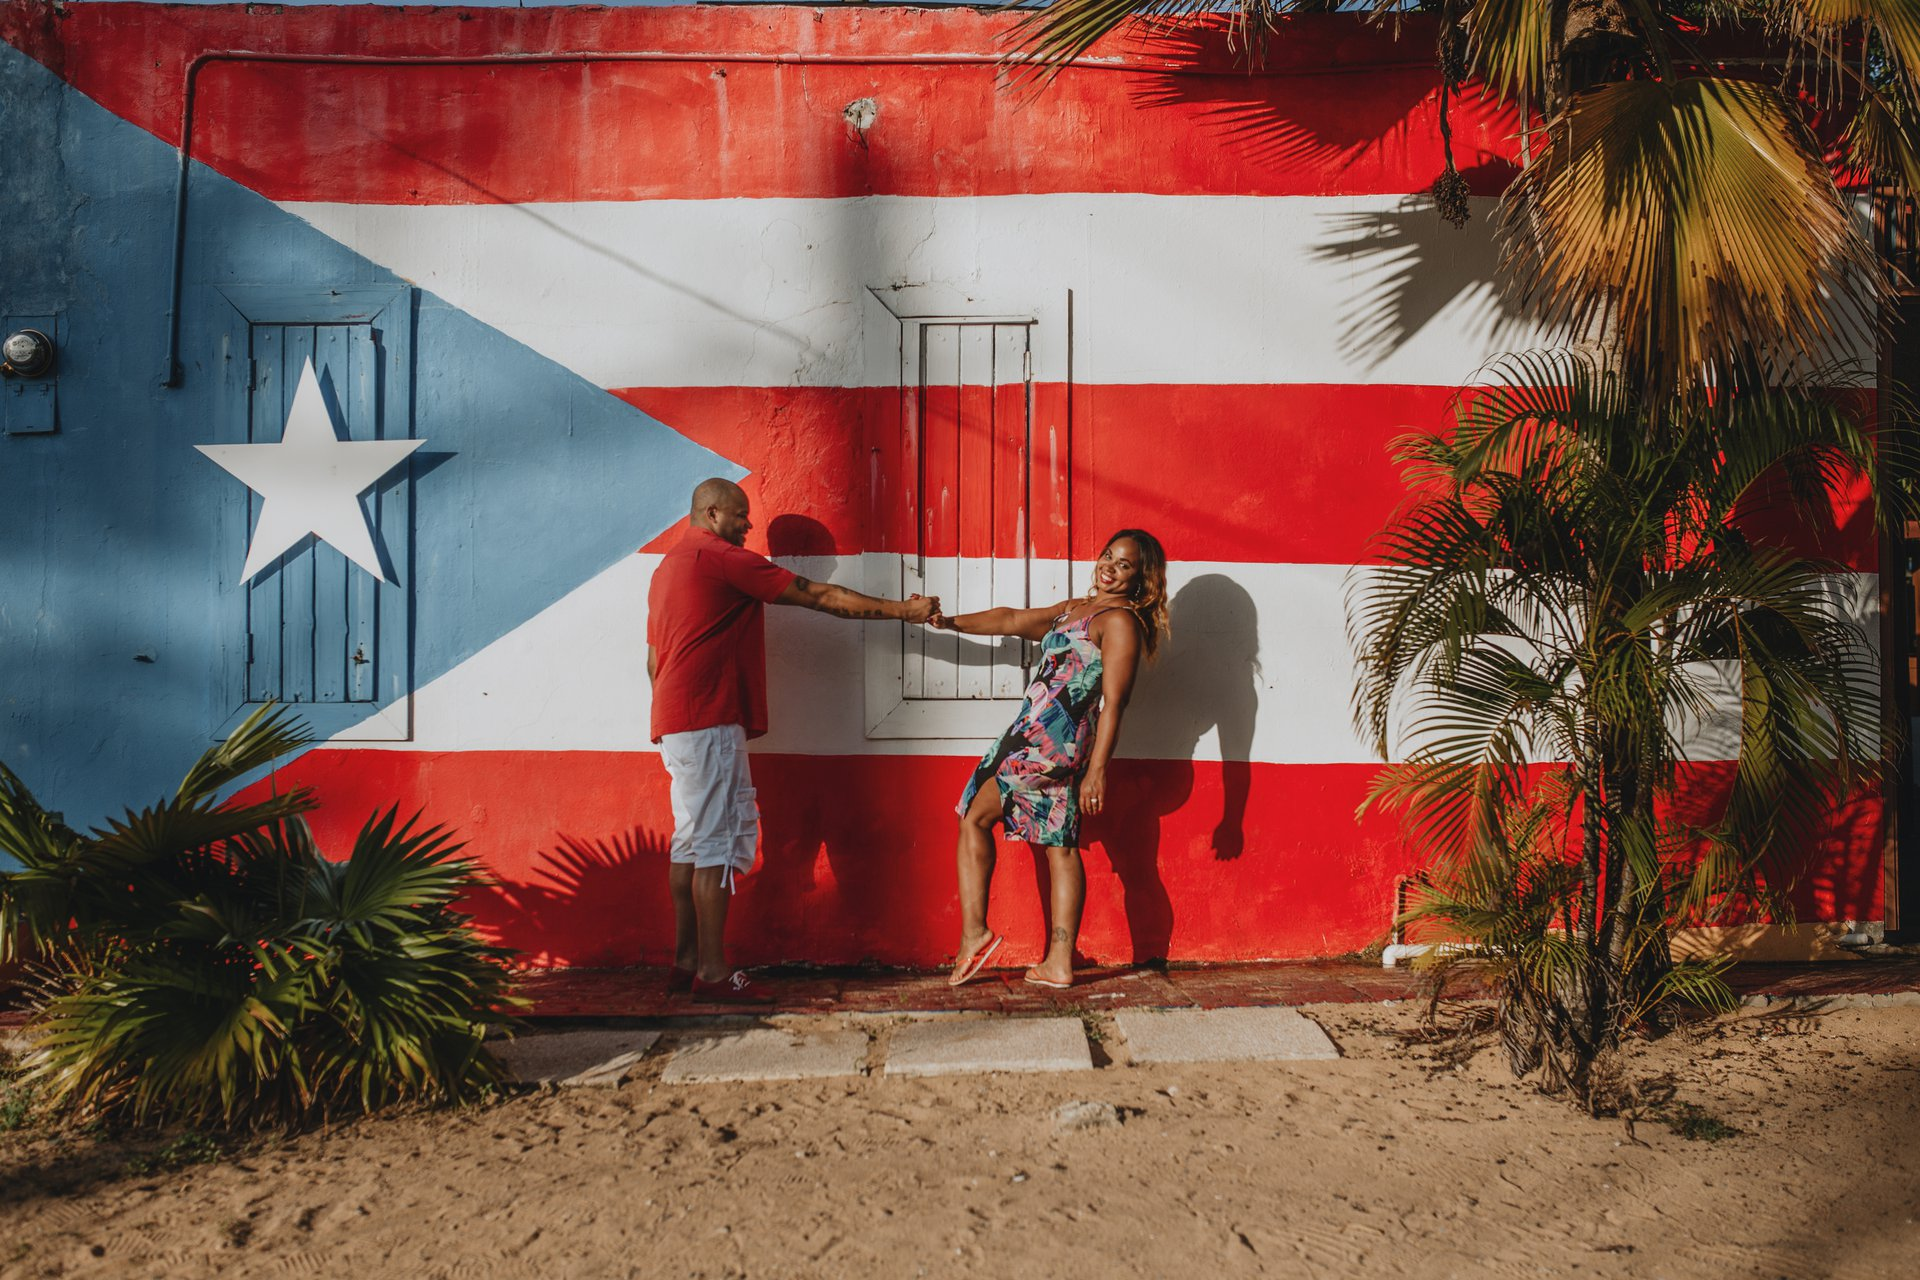 Flytographer Travel Story - The Beautiful Island of Puerto Rico